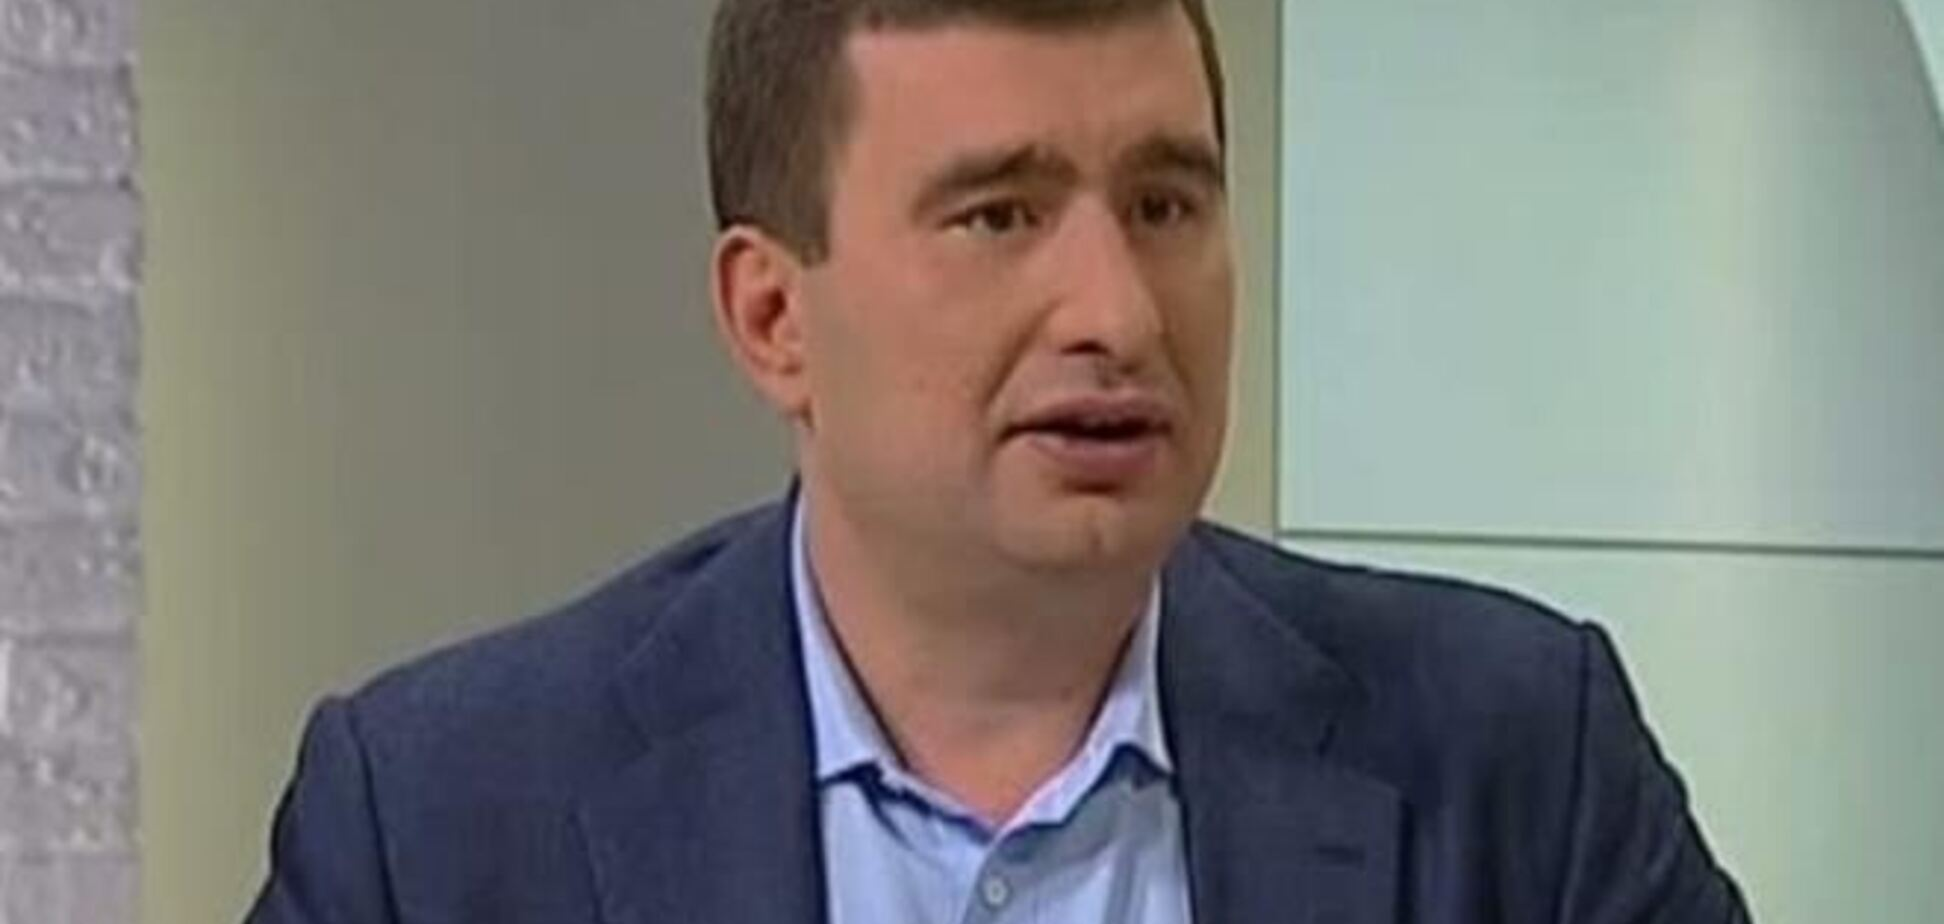 Марков програв суд Рибаку